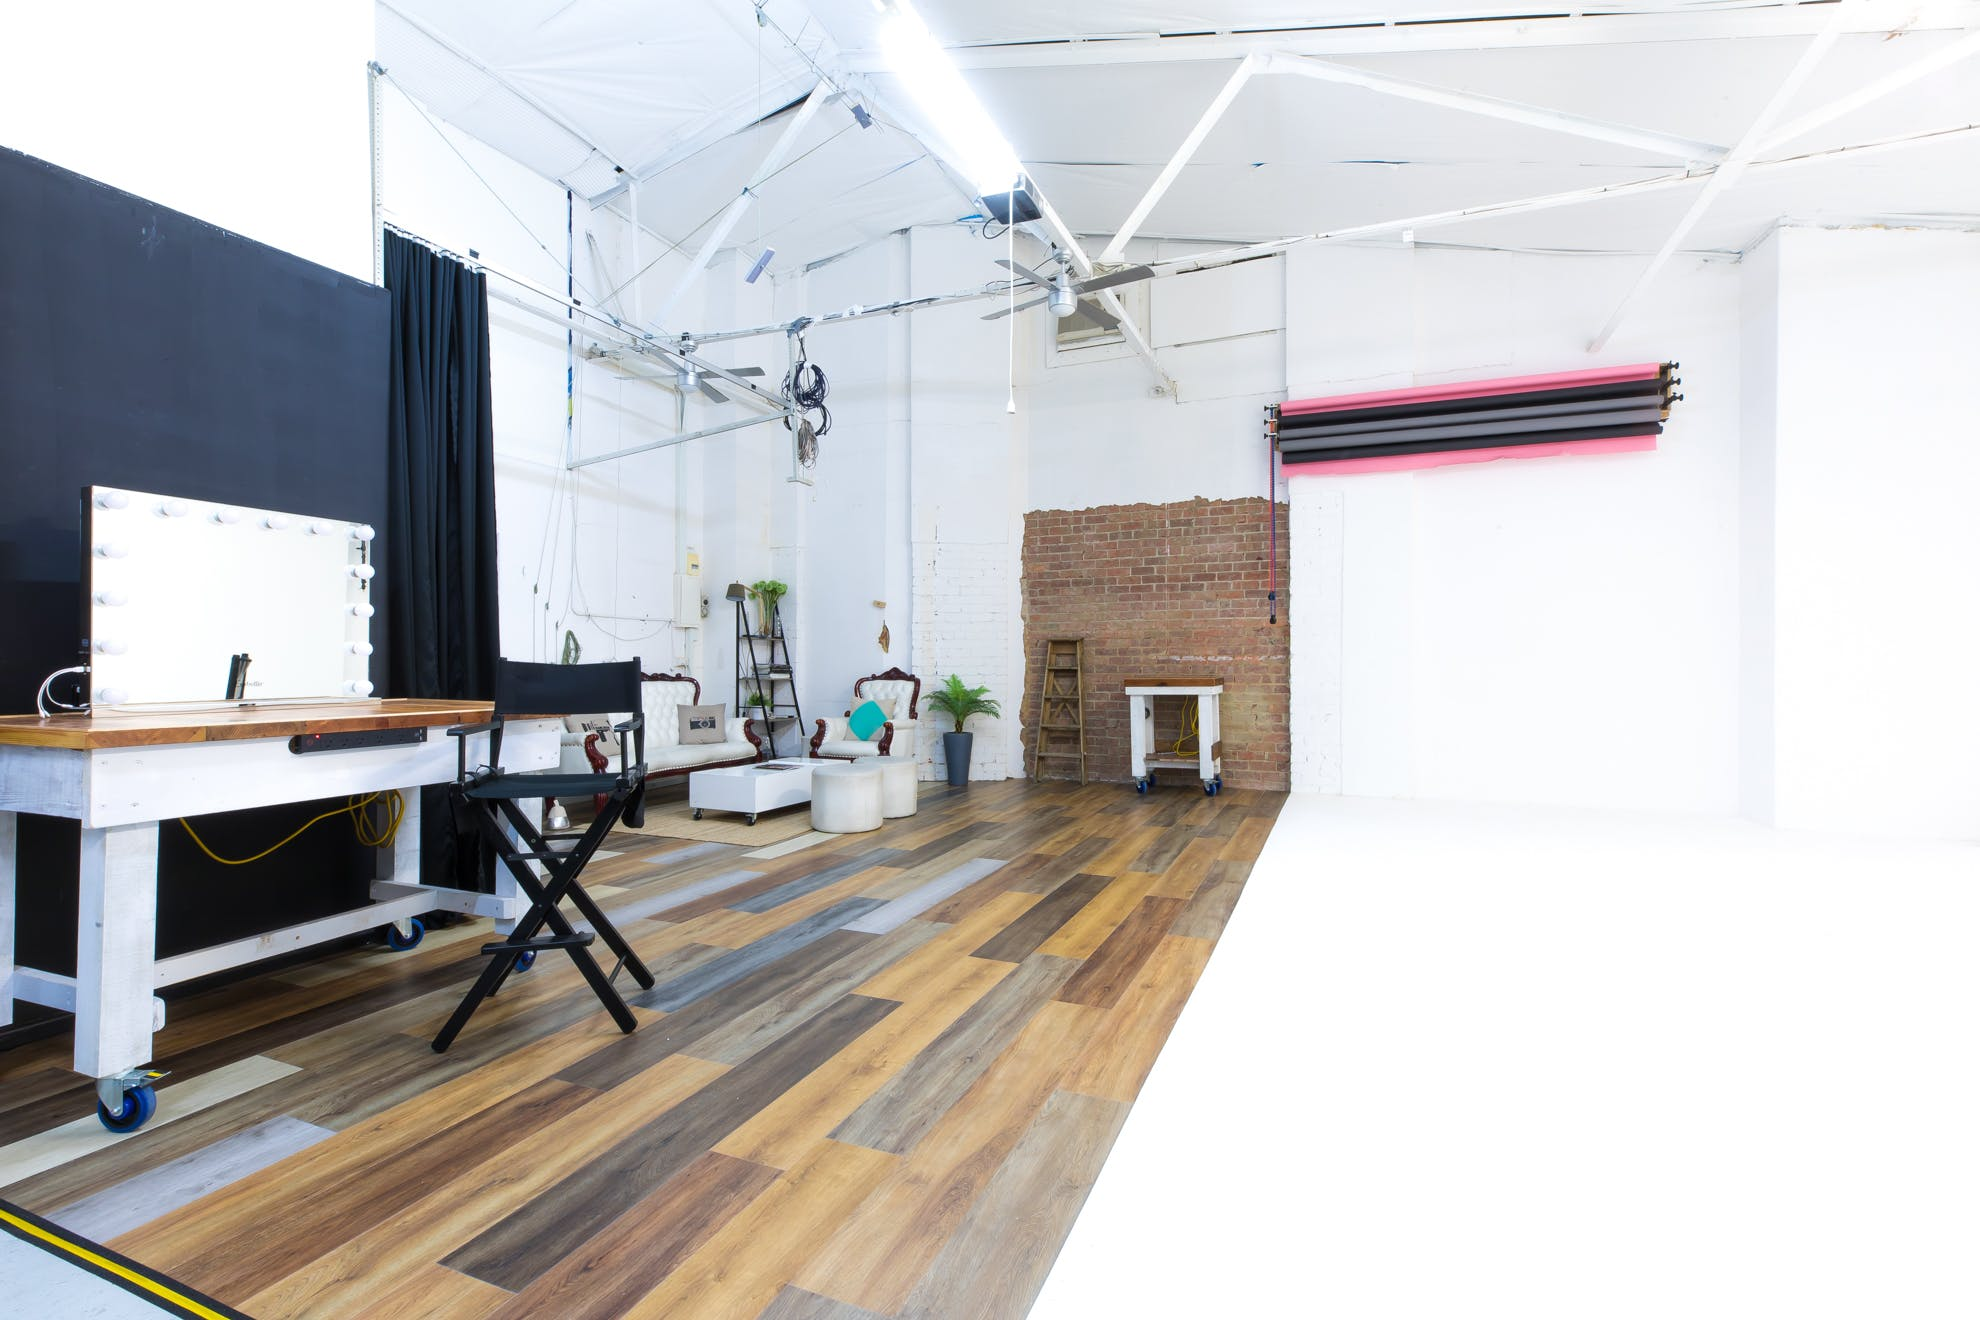 Main Studio, creative studio at Epic Studios, image 1